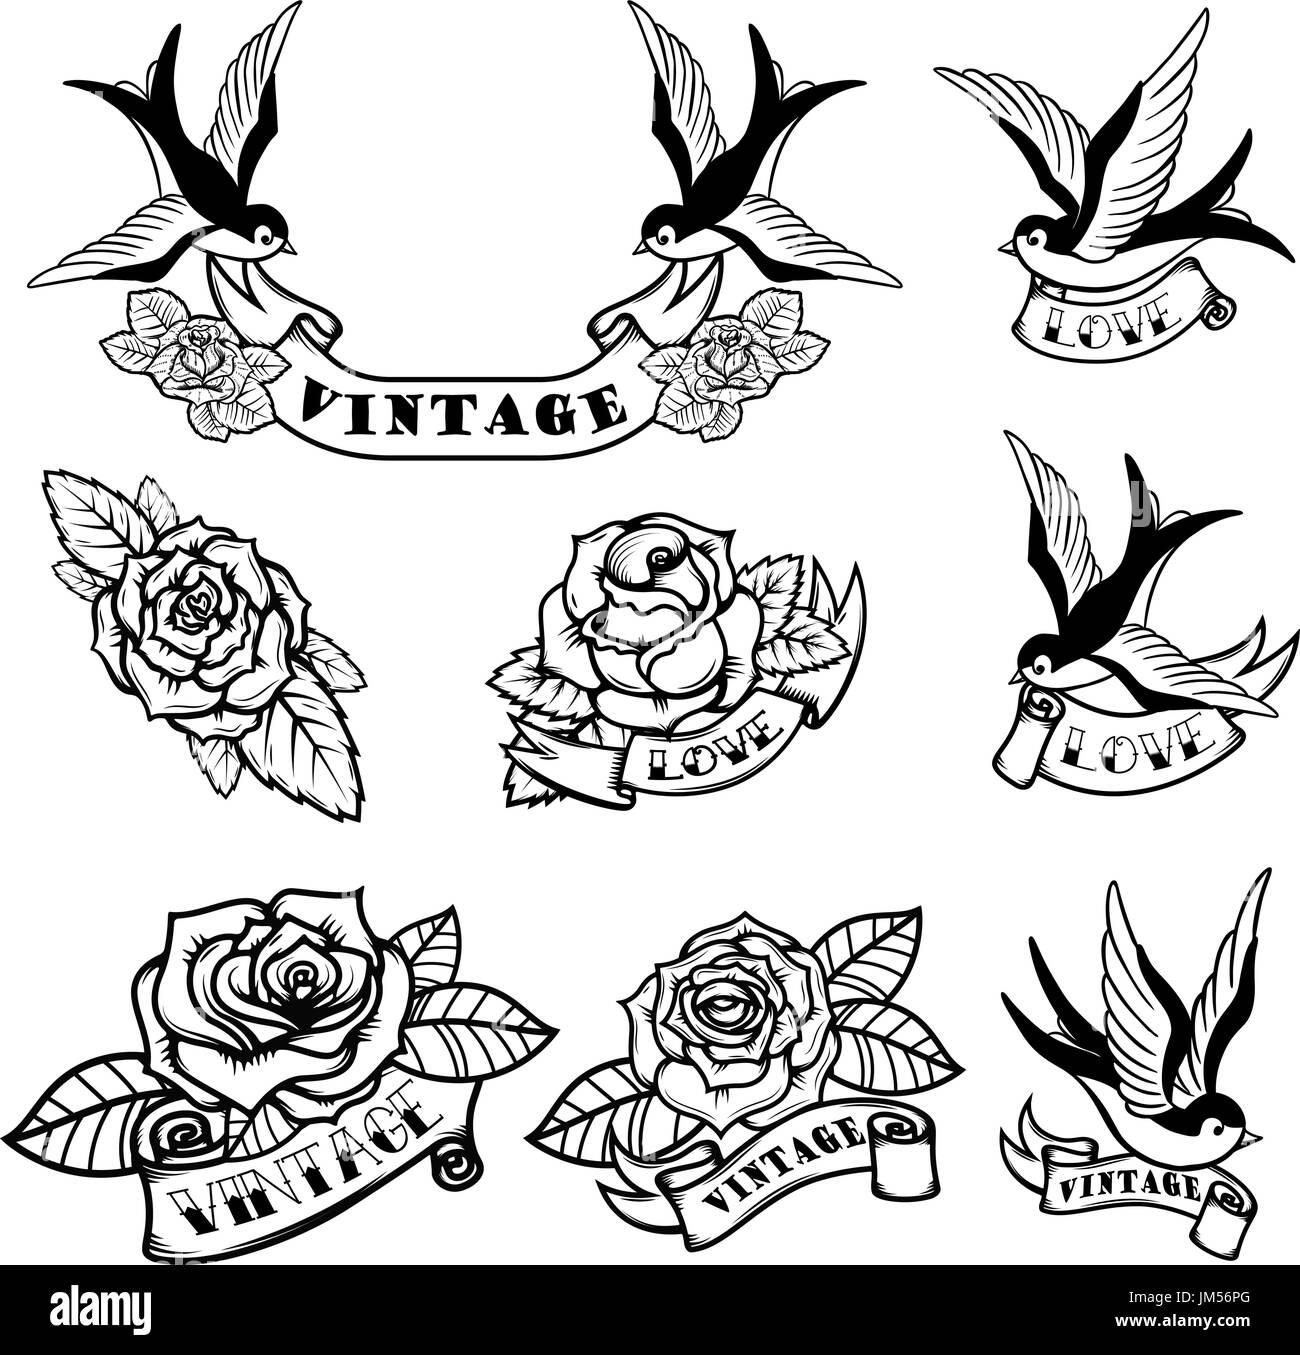 Conjunto De Plantillas De Tatuajes De Golondrinas Y Rosas Tatuaje